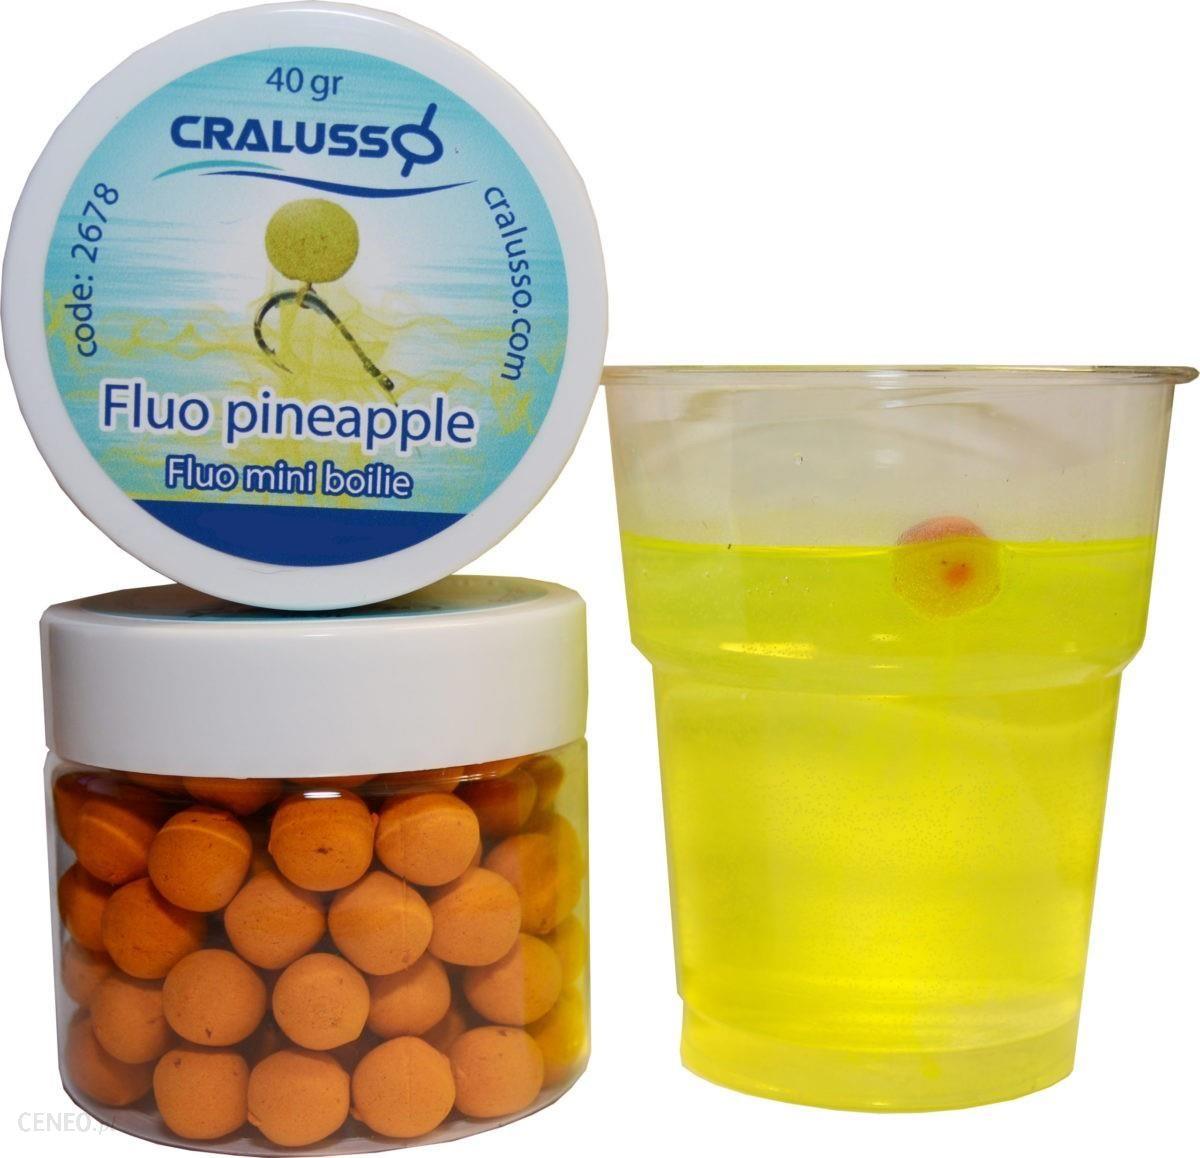 Cralusso Kulki Fluo Mini Boilie 12Mm 40G Pineapple 2678